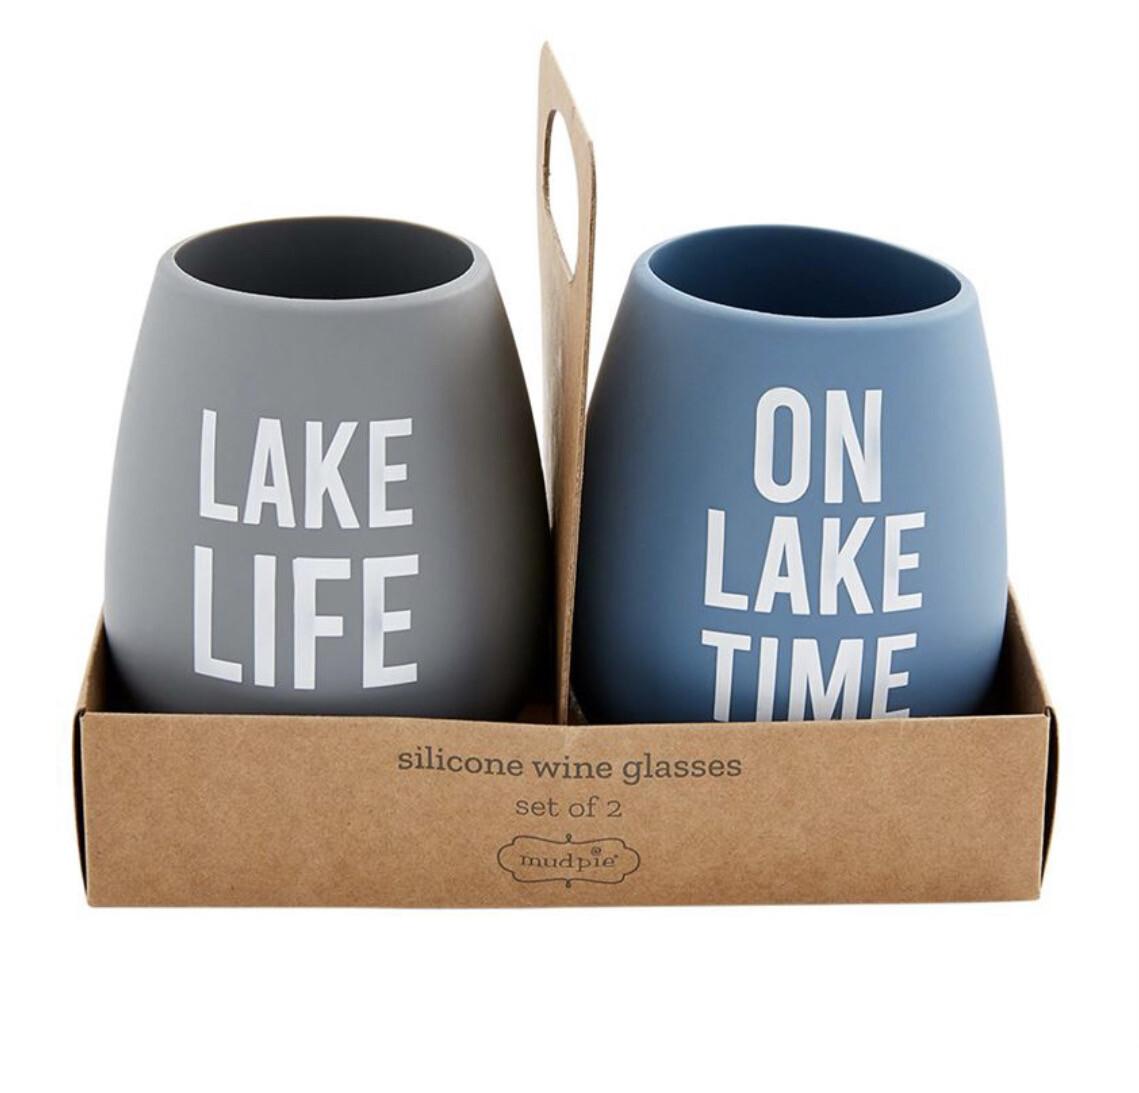 Set of 2 Lake Life Silicone Wine Glasses